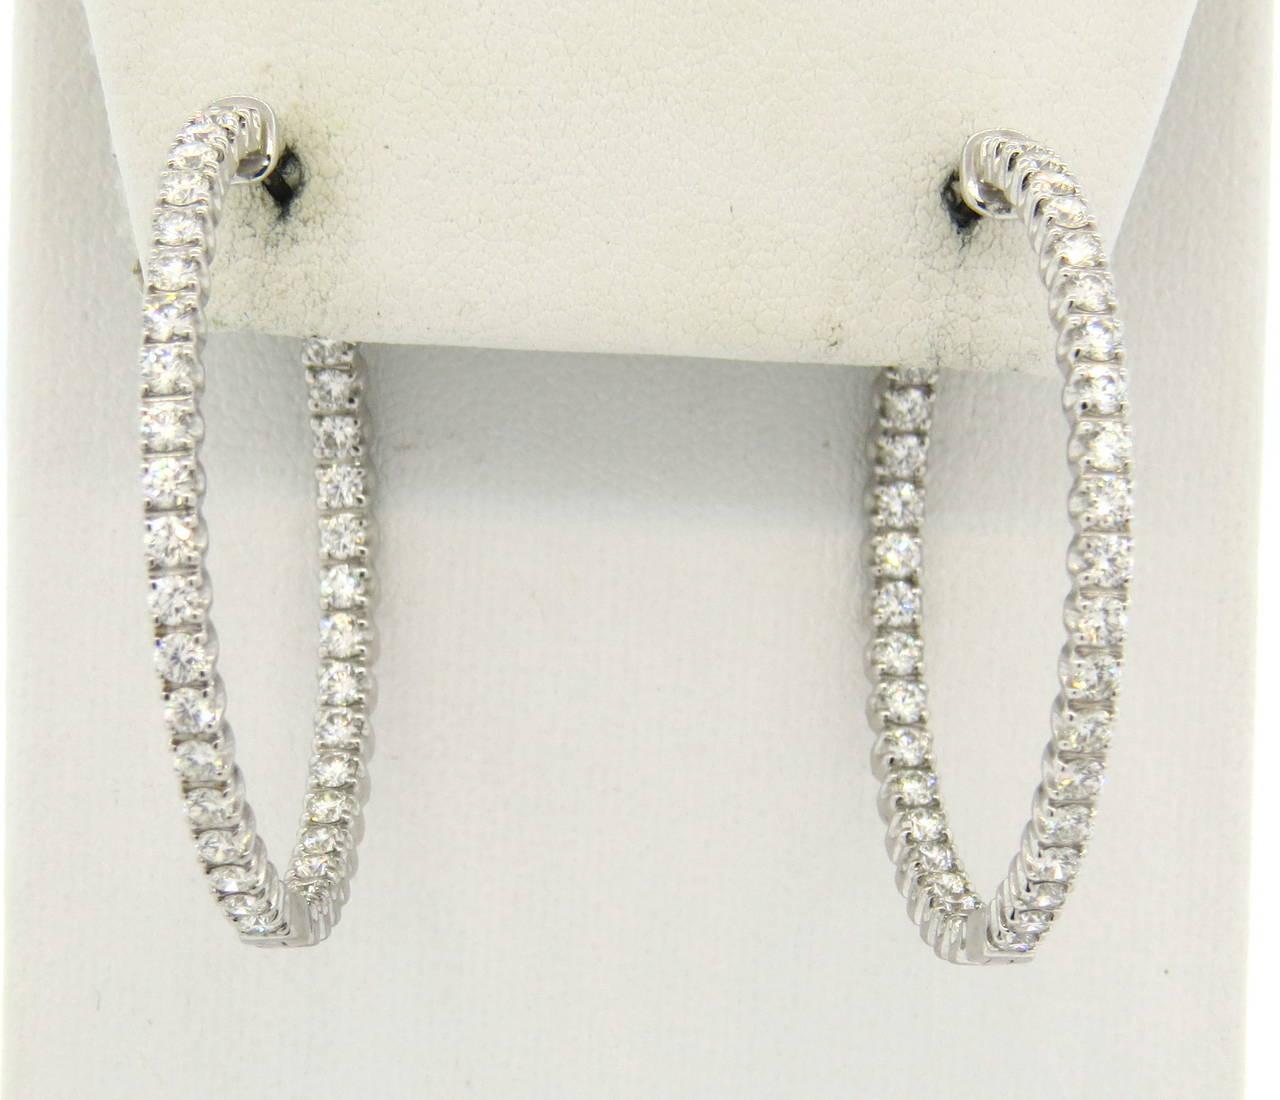 42b8457f4 Women's Tiffany & Co. Metro Inside Out Diamond Gold Hinged Hoop Earrings  For Sale